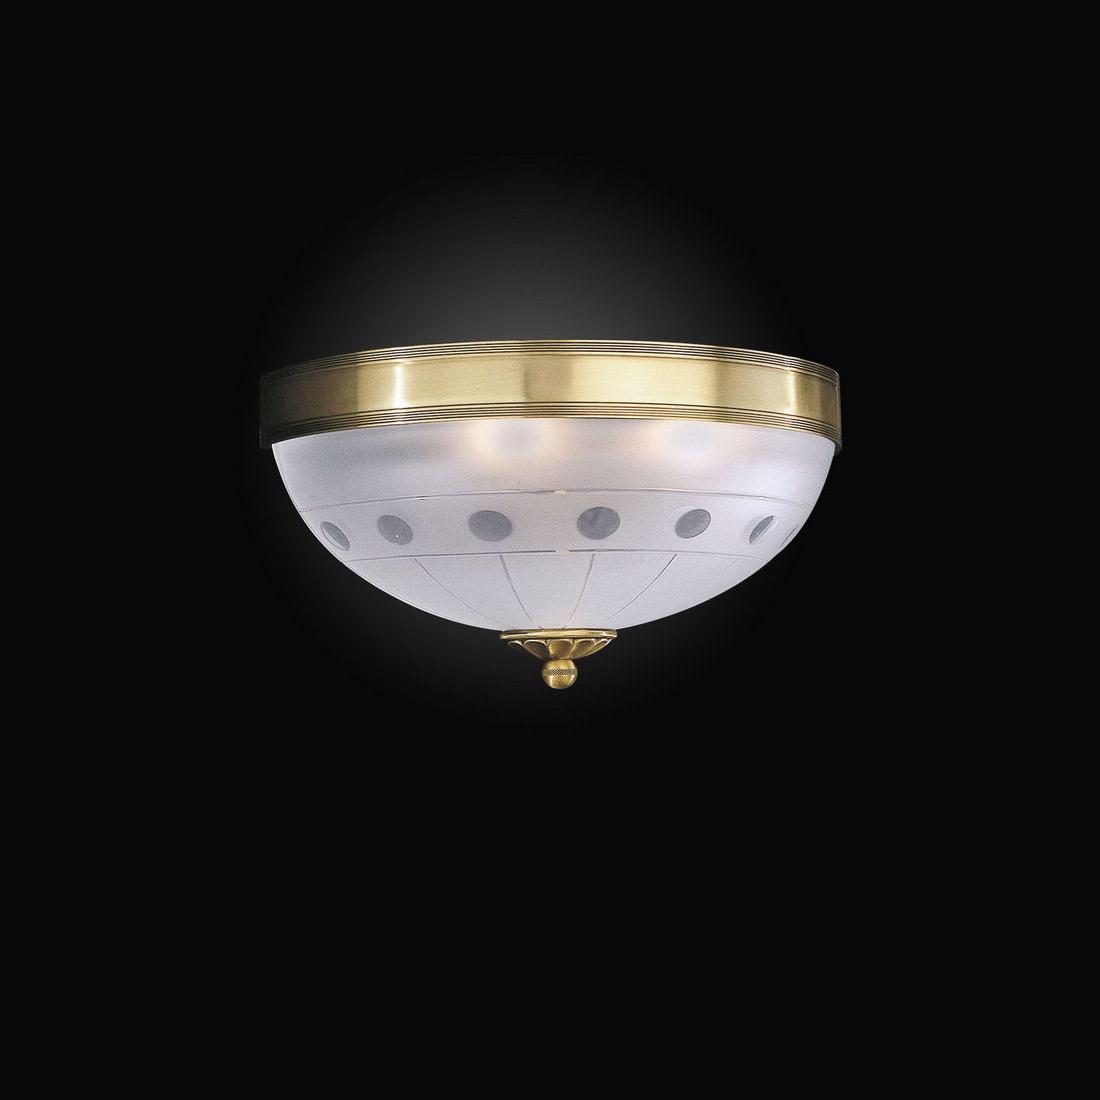 цена на Настенный светильник Reccagni Angelo A 2305/2